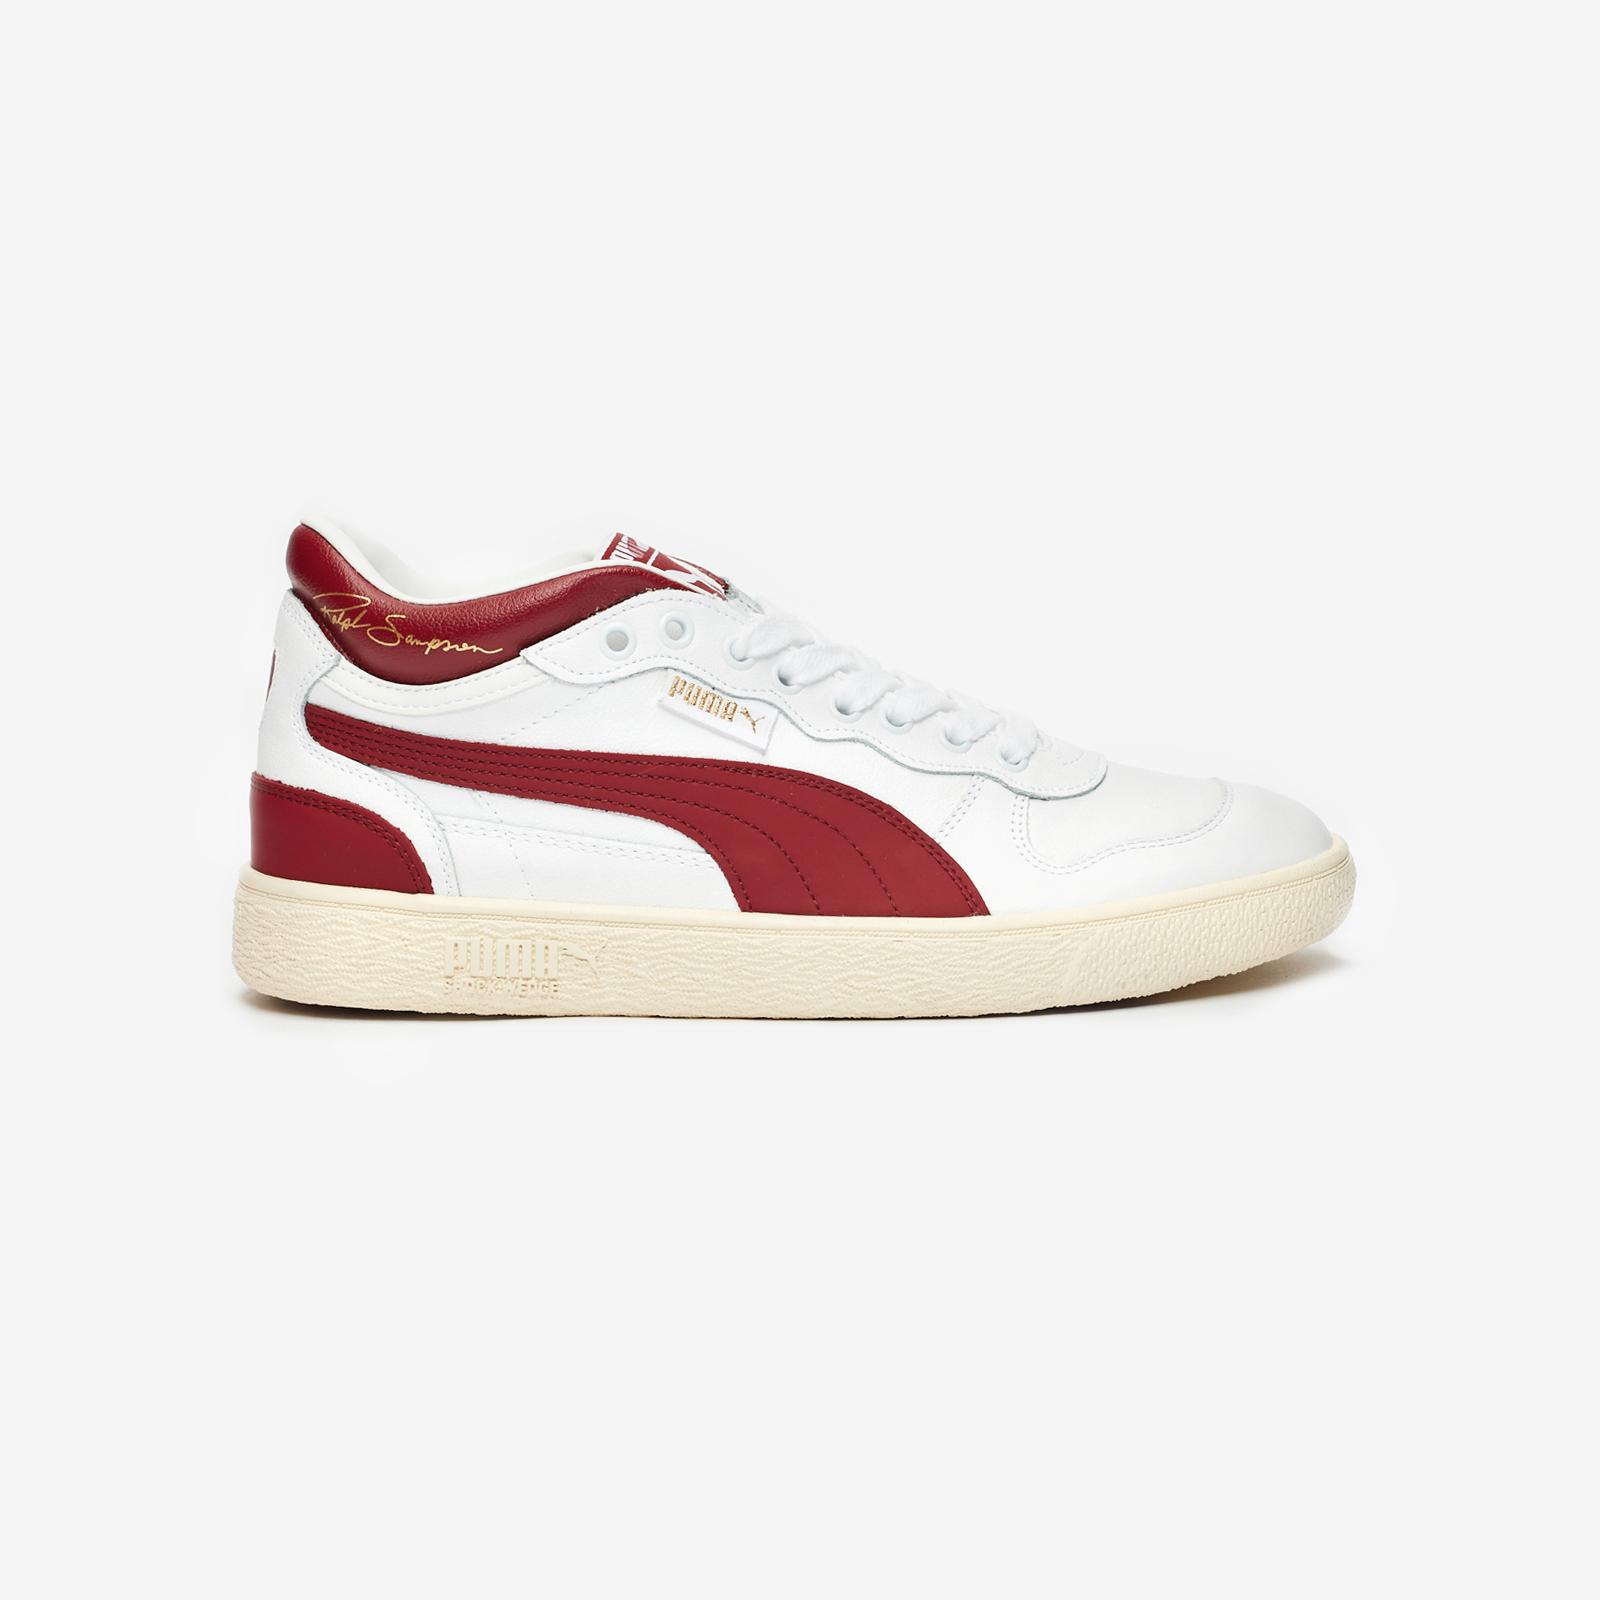 Puma Ralph Sampson Demi OG - 371683-01 - SNS   sneakers ...